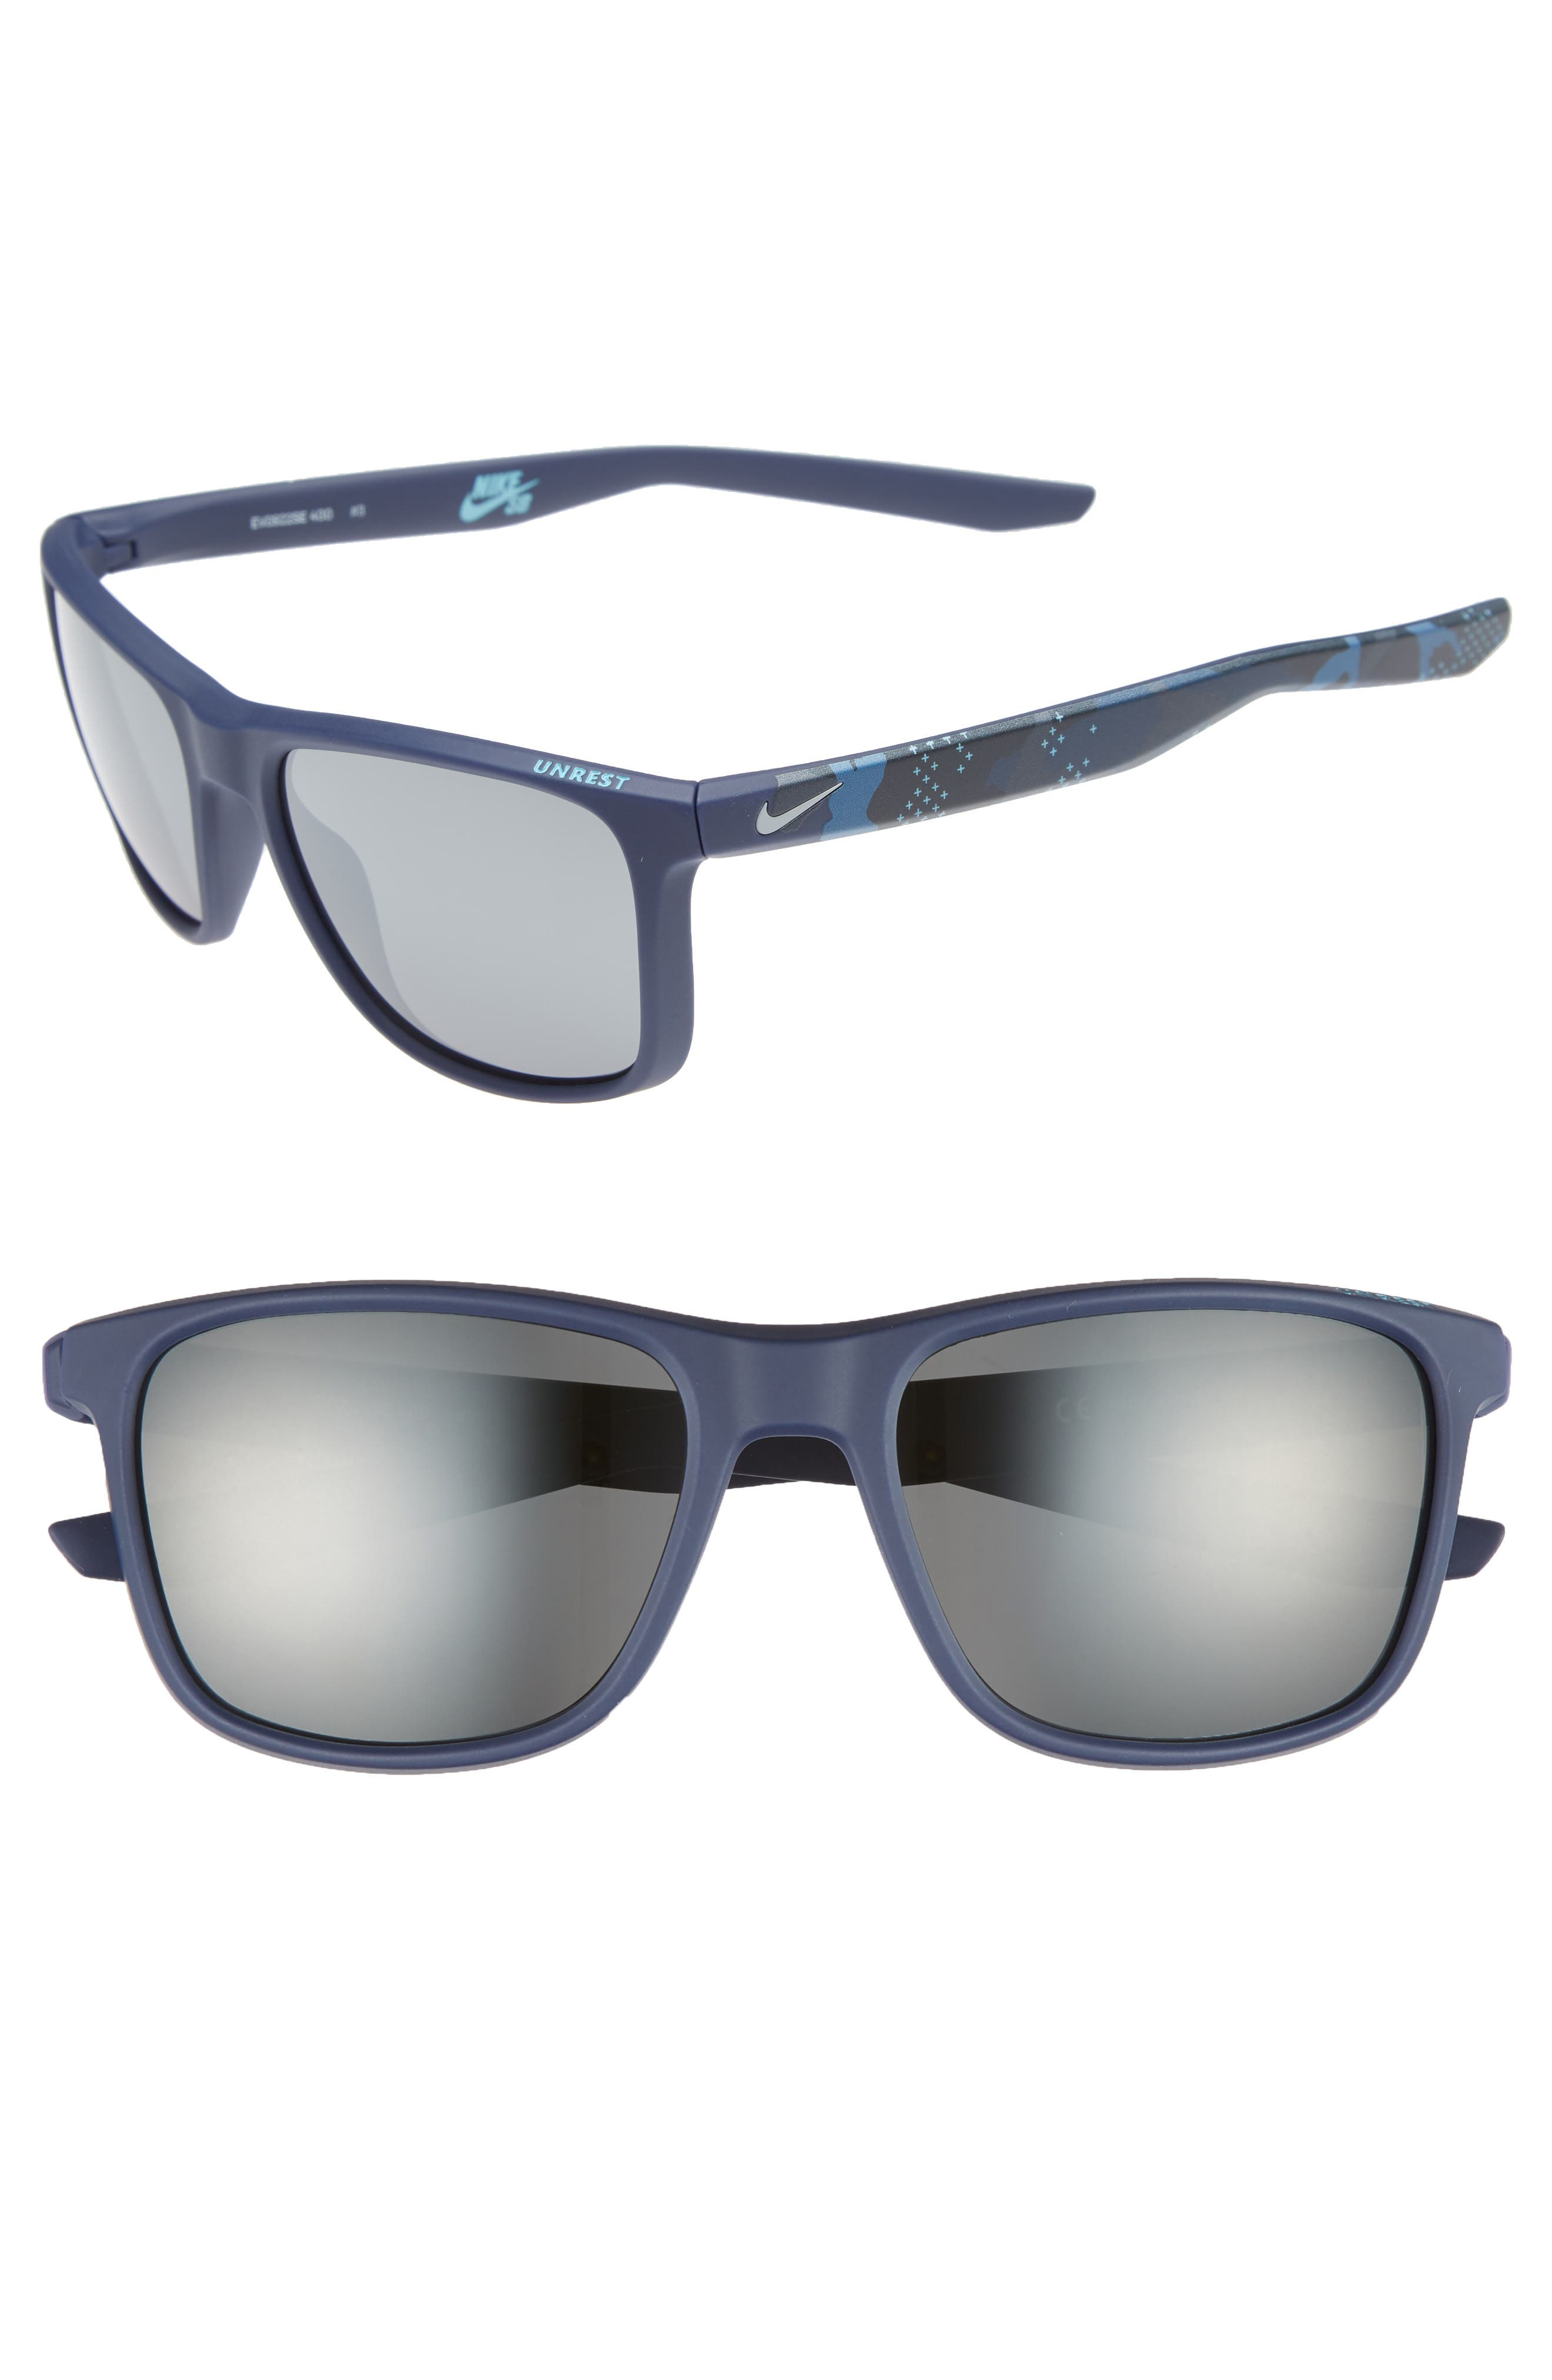 Unrest SE 57mm Sunglasses,                             Main thumbnail 1, color,                             Midnight Teal/ Dark Grey